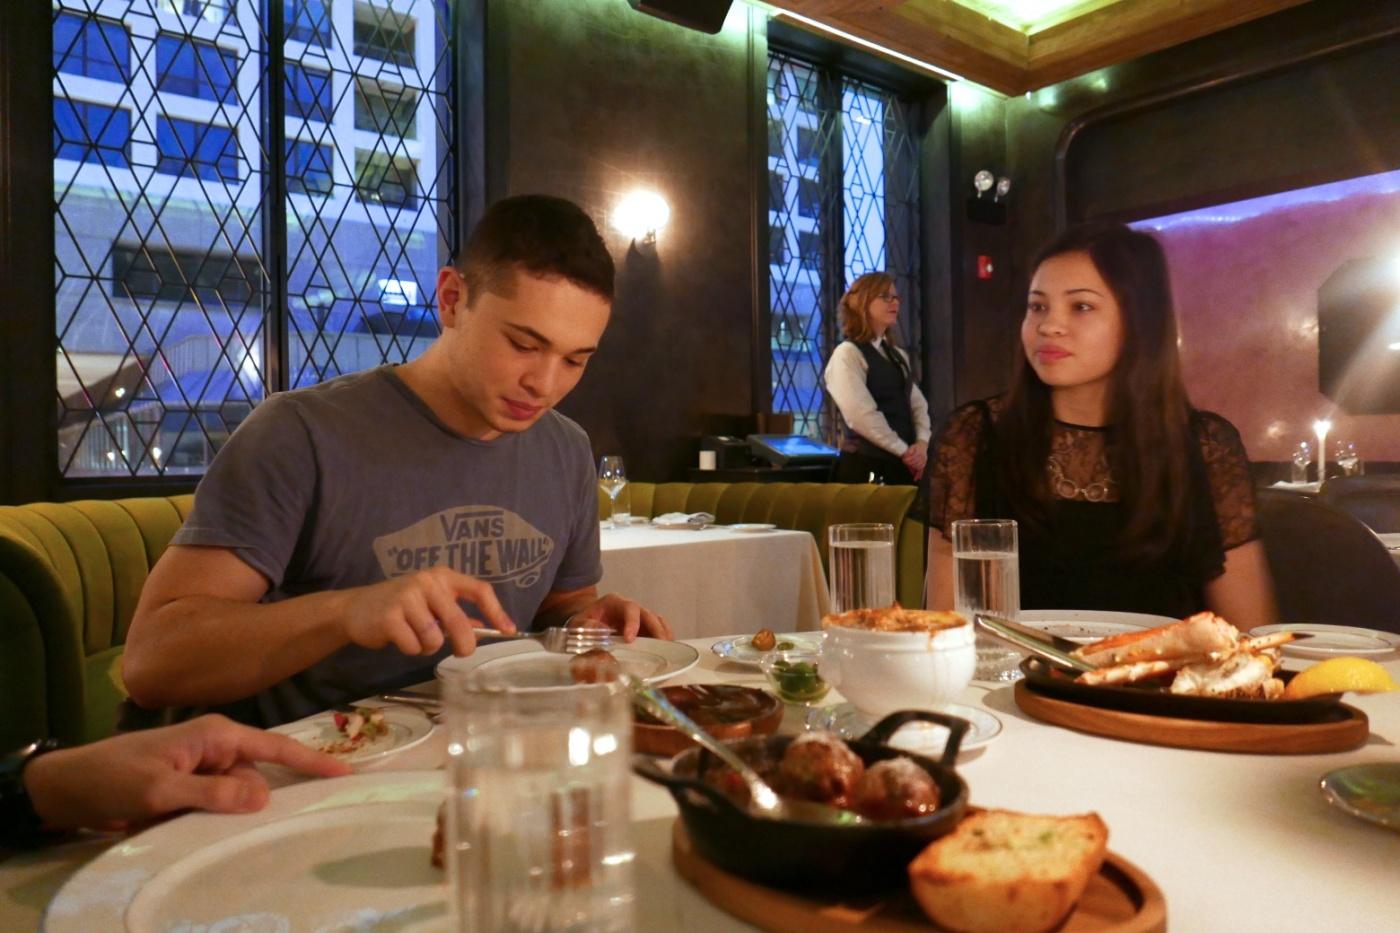 Dinner at Maple & Ash